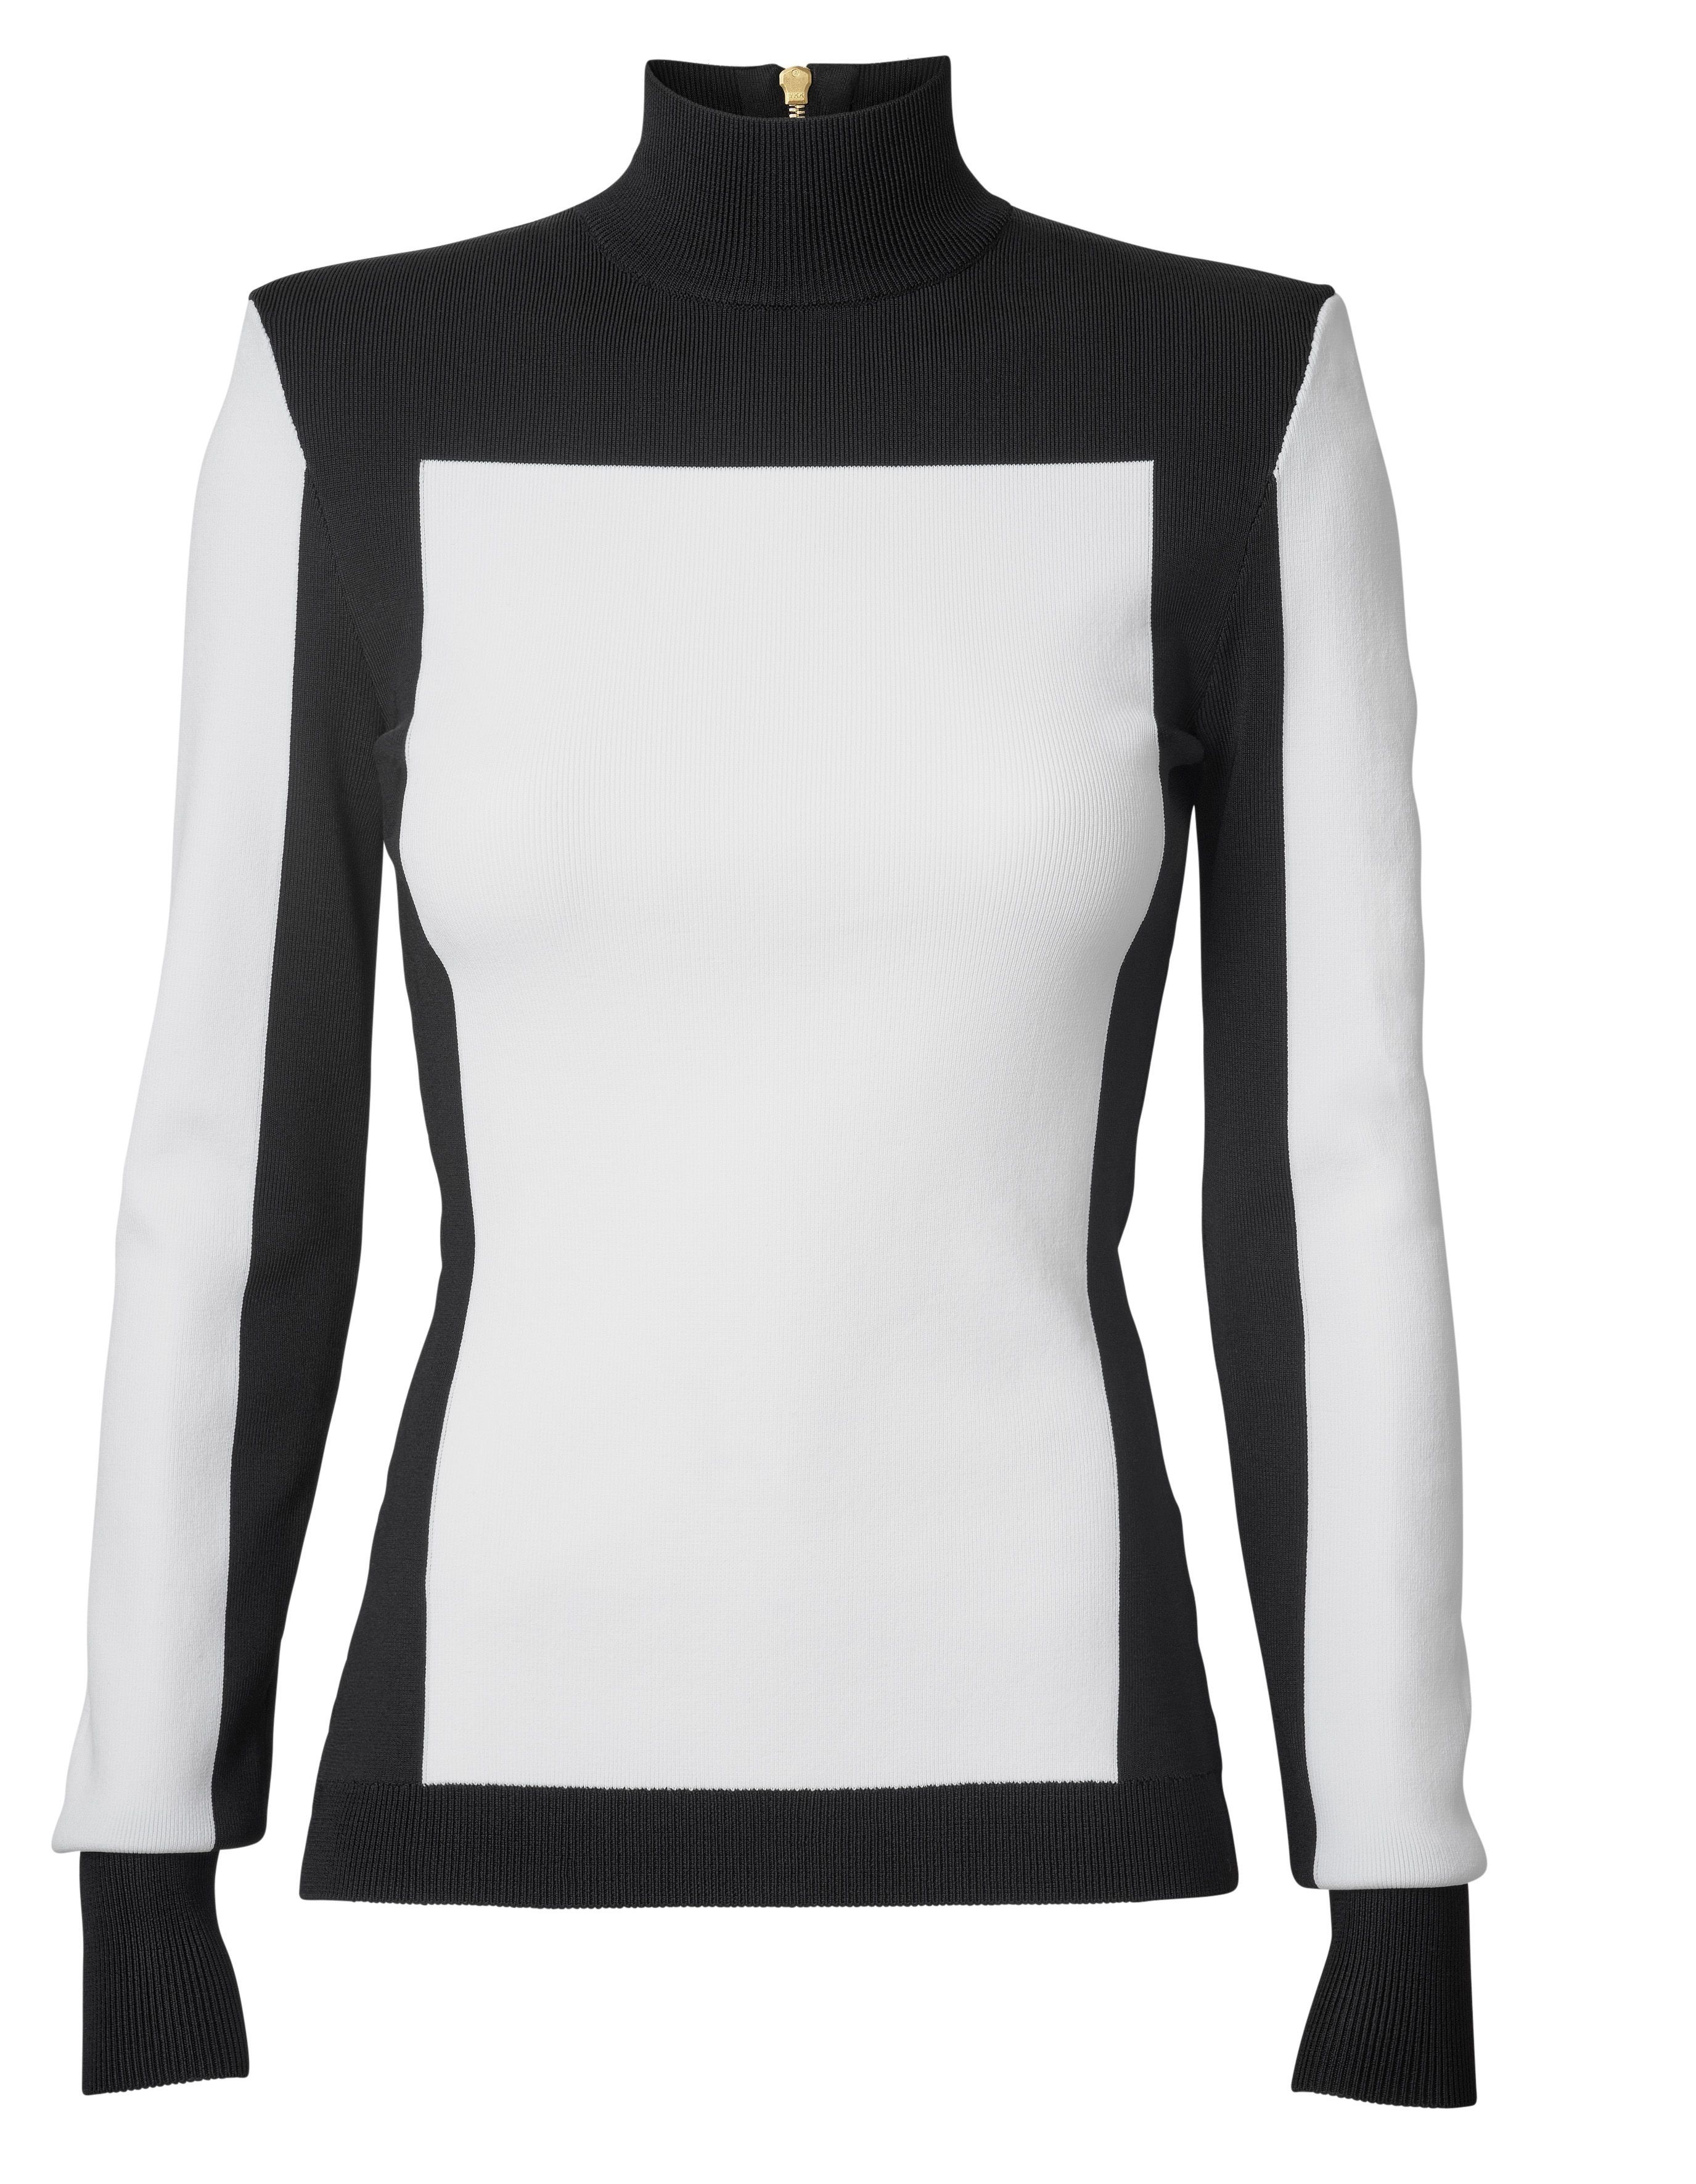 f33fc6eeb6527d H M x Balmain Colorblock Turtleneck sweater seen on Bethenny Frankel ...